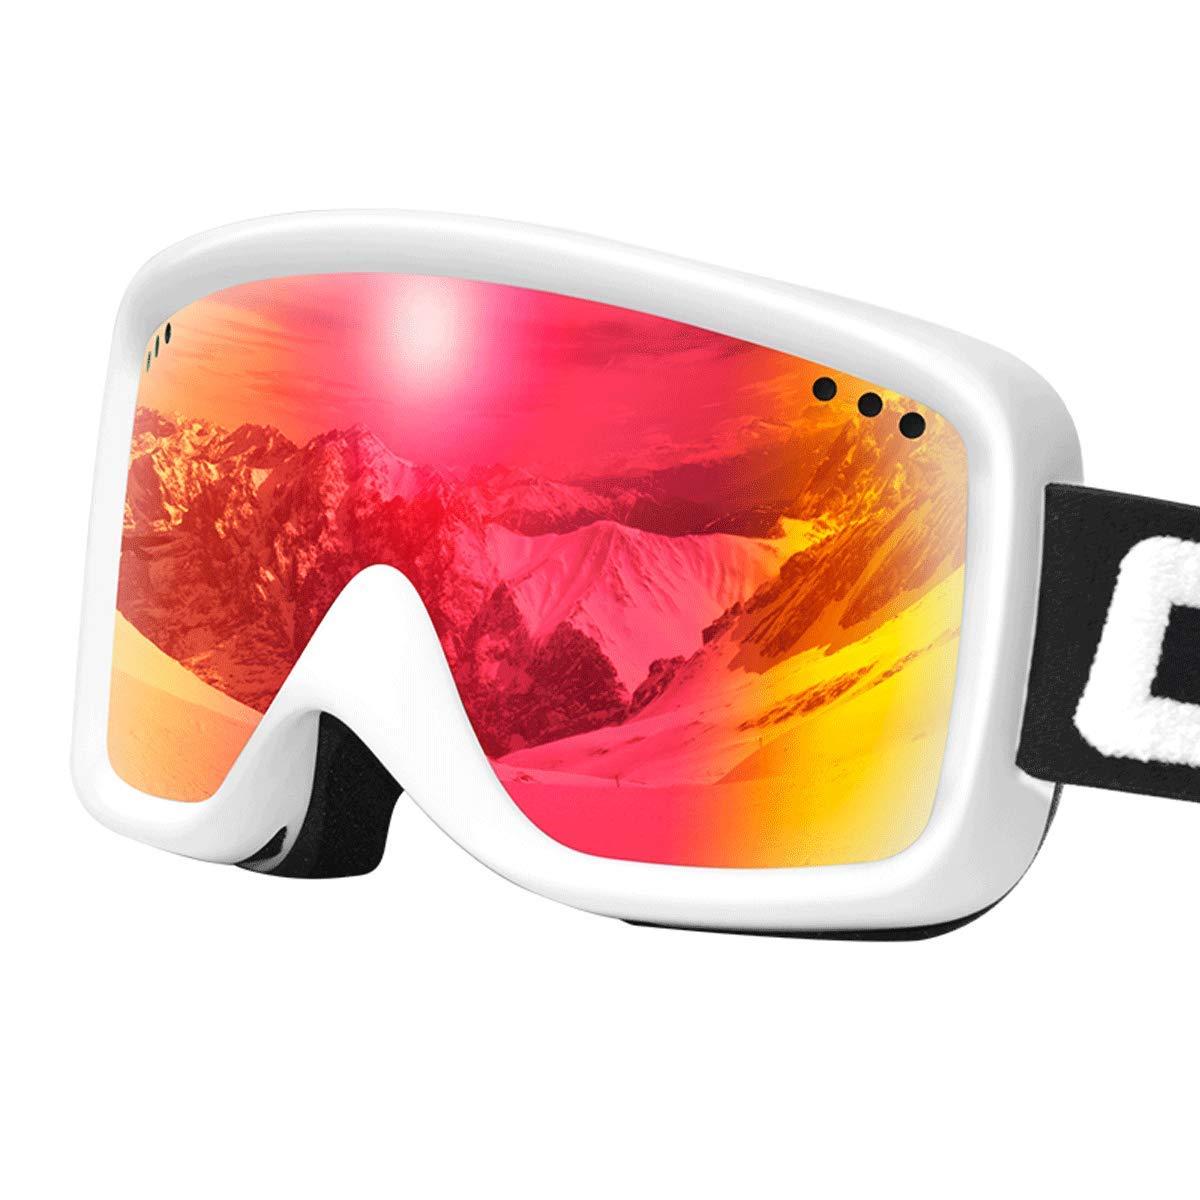 RMXMY スキーゴーグルHD二重層防曇および抗UV男性および女性大人の大型アウトドアクライミングゴーグル (色 : 赤) 赤